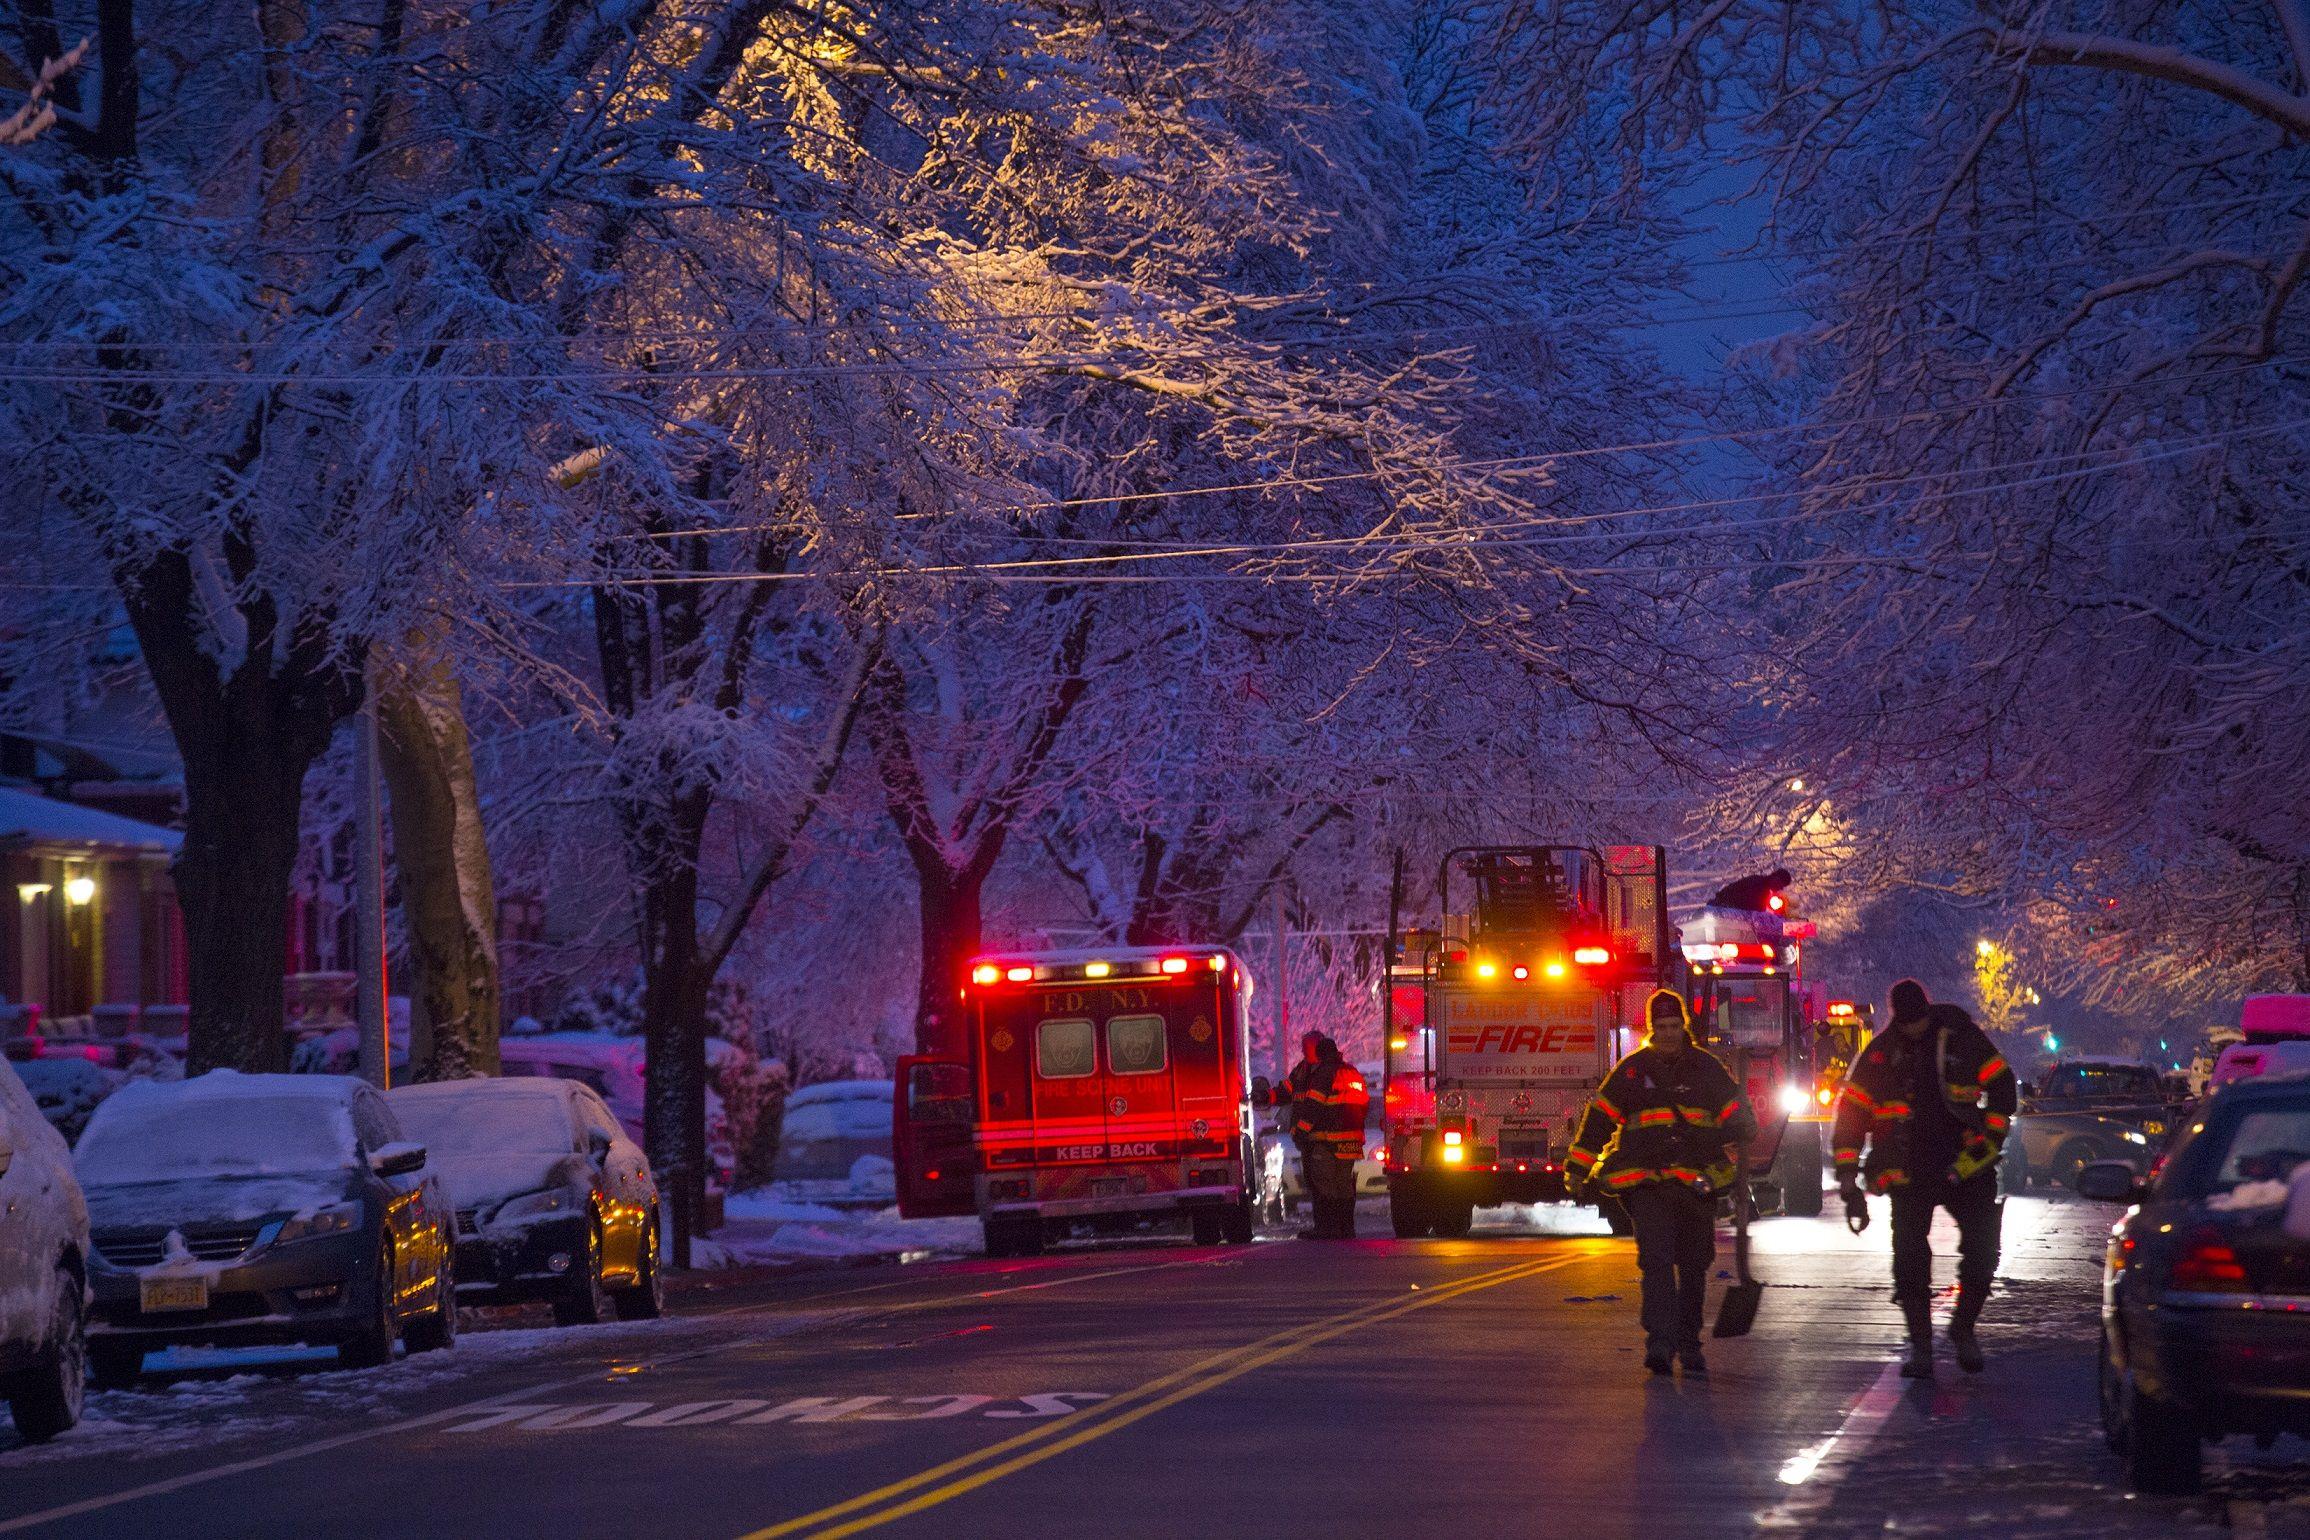 7 kids from Orthodox Jewish family killed in Brooklyn fire